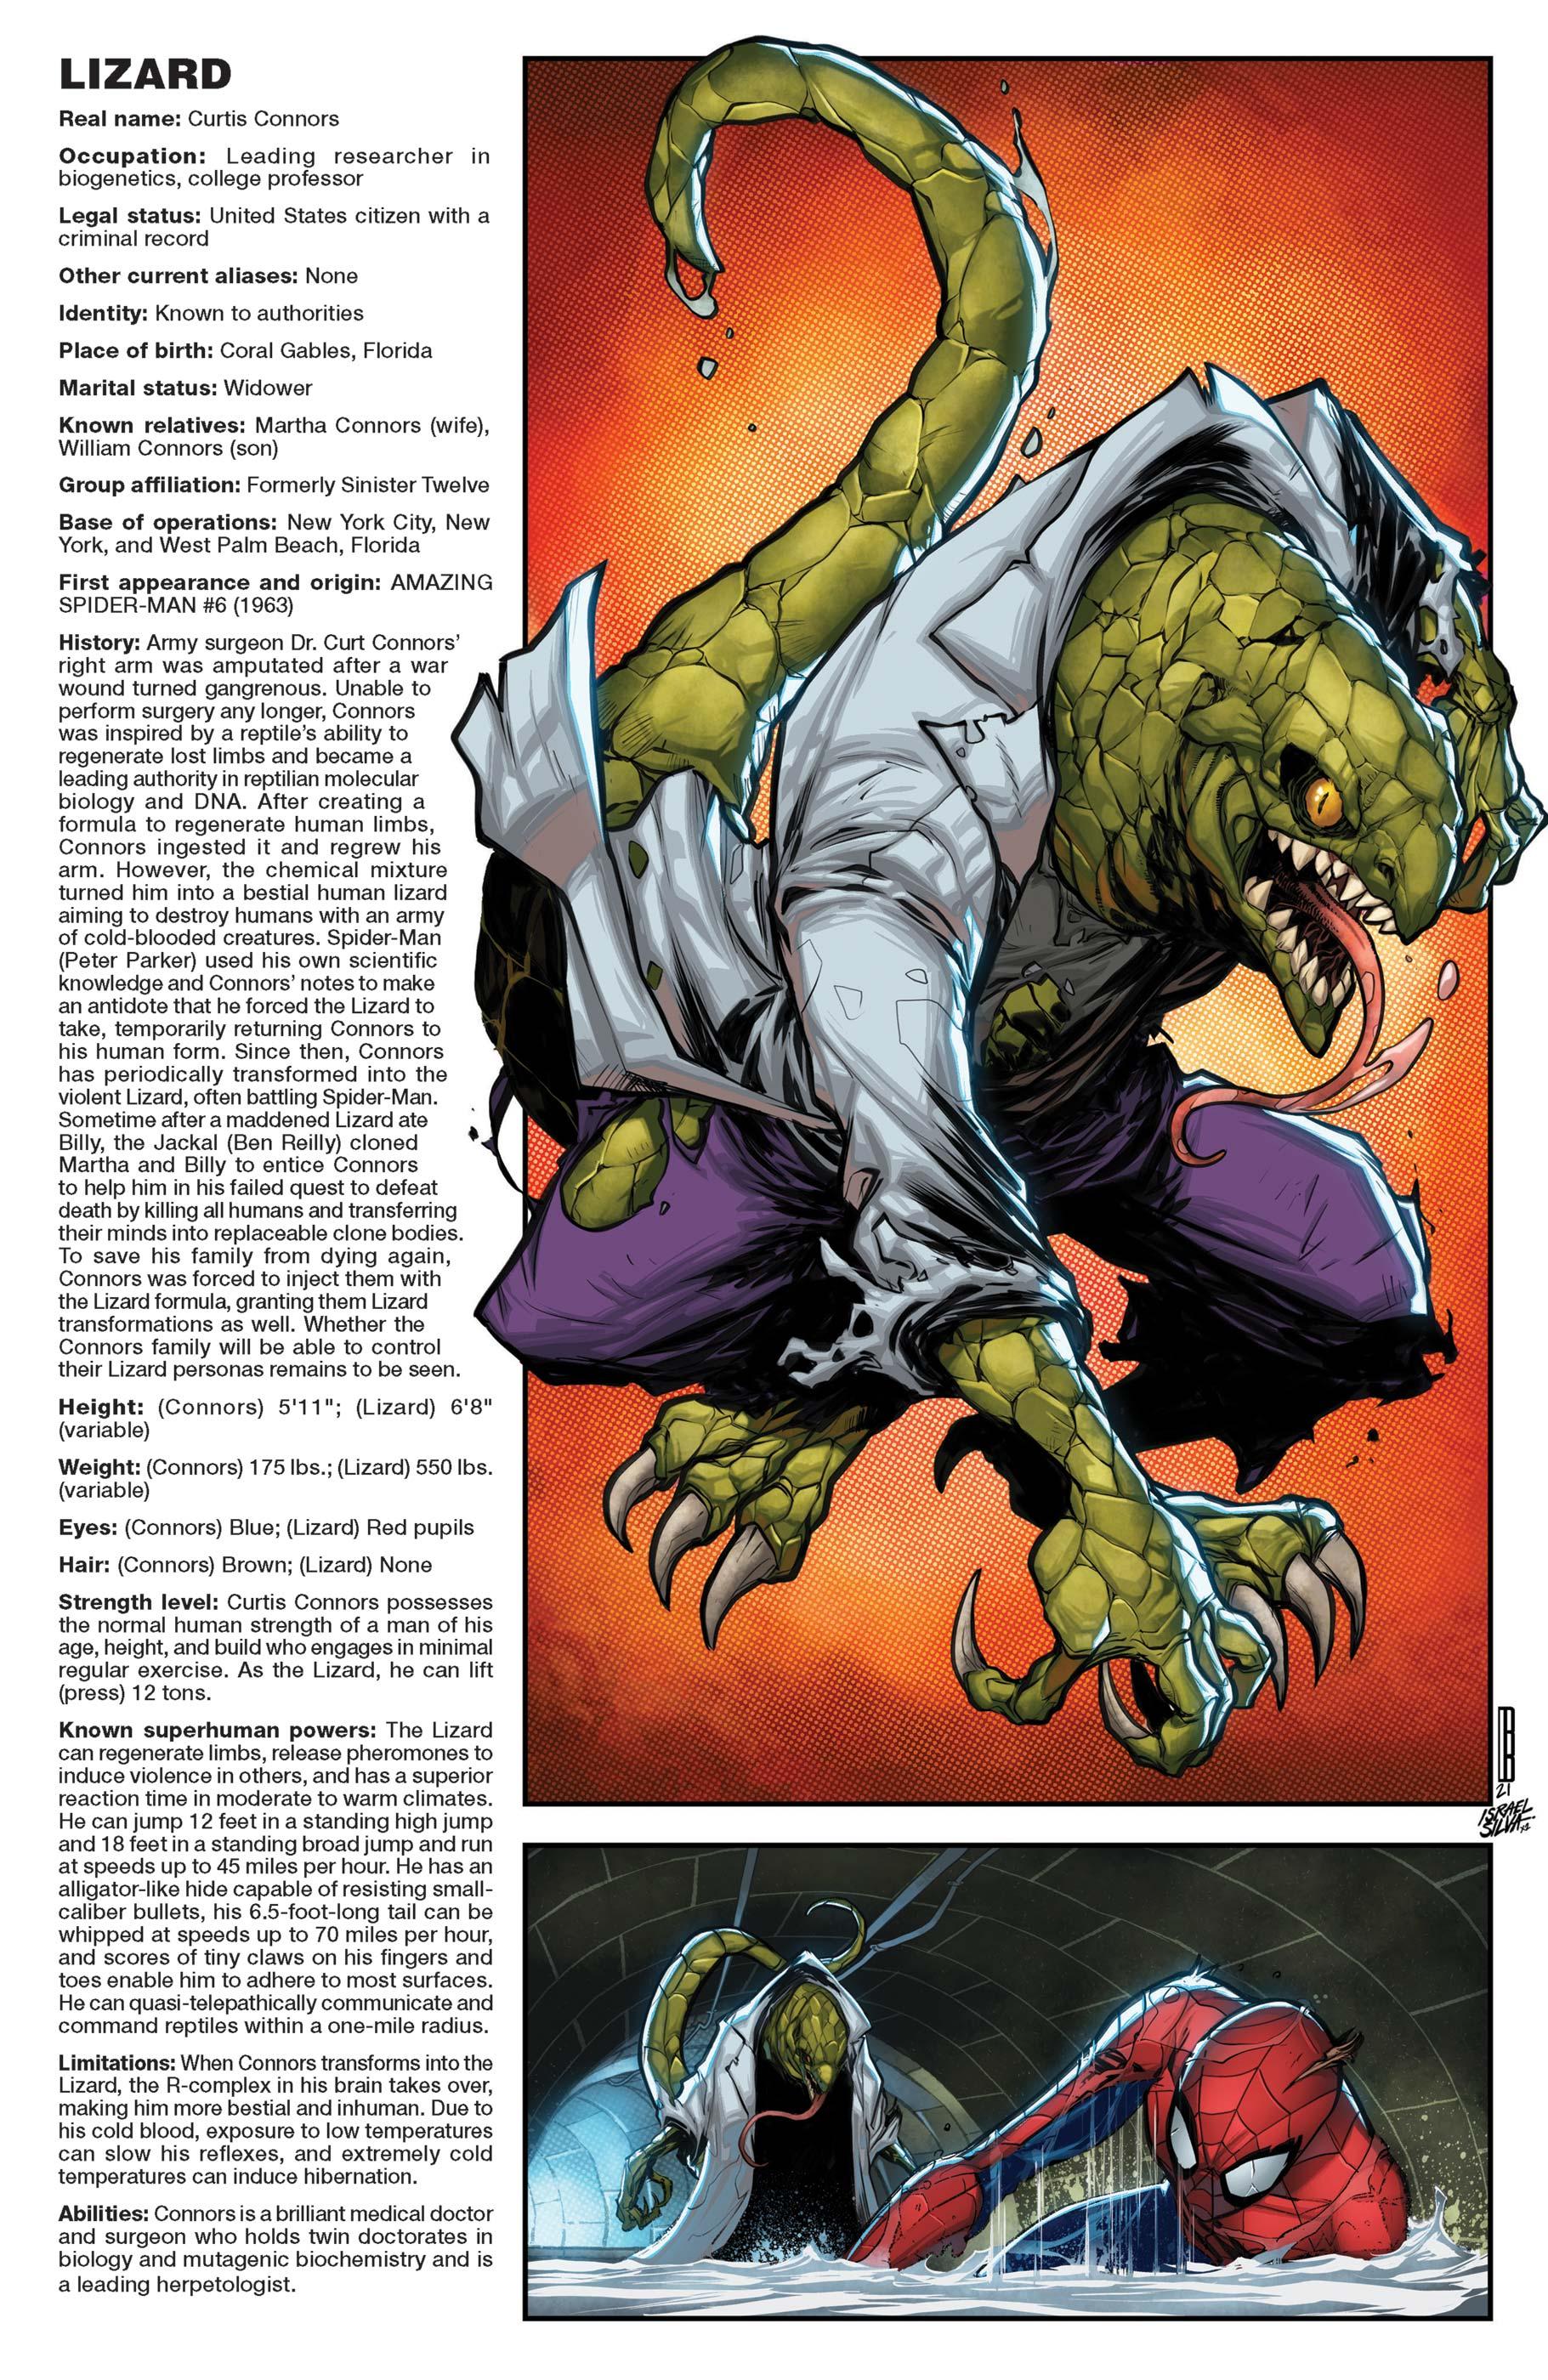 The Amazing Spider-Man (2018) #71 (Variant)